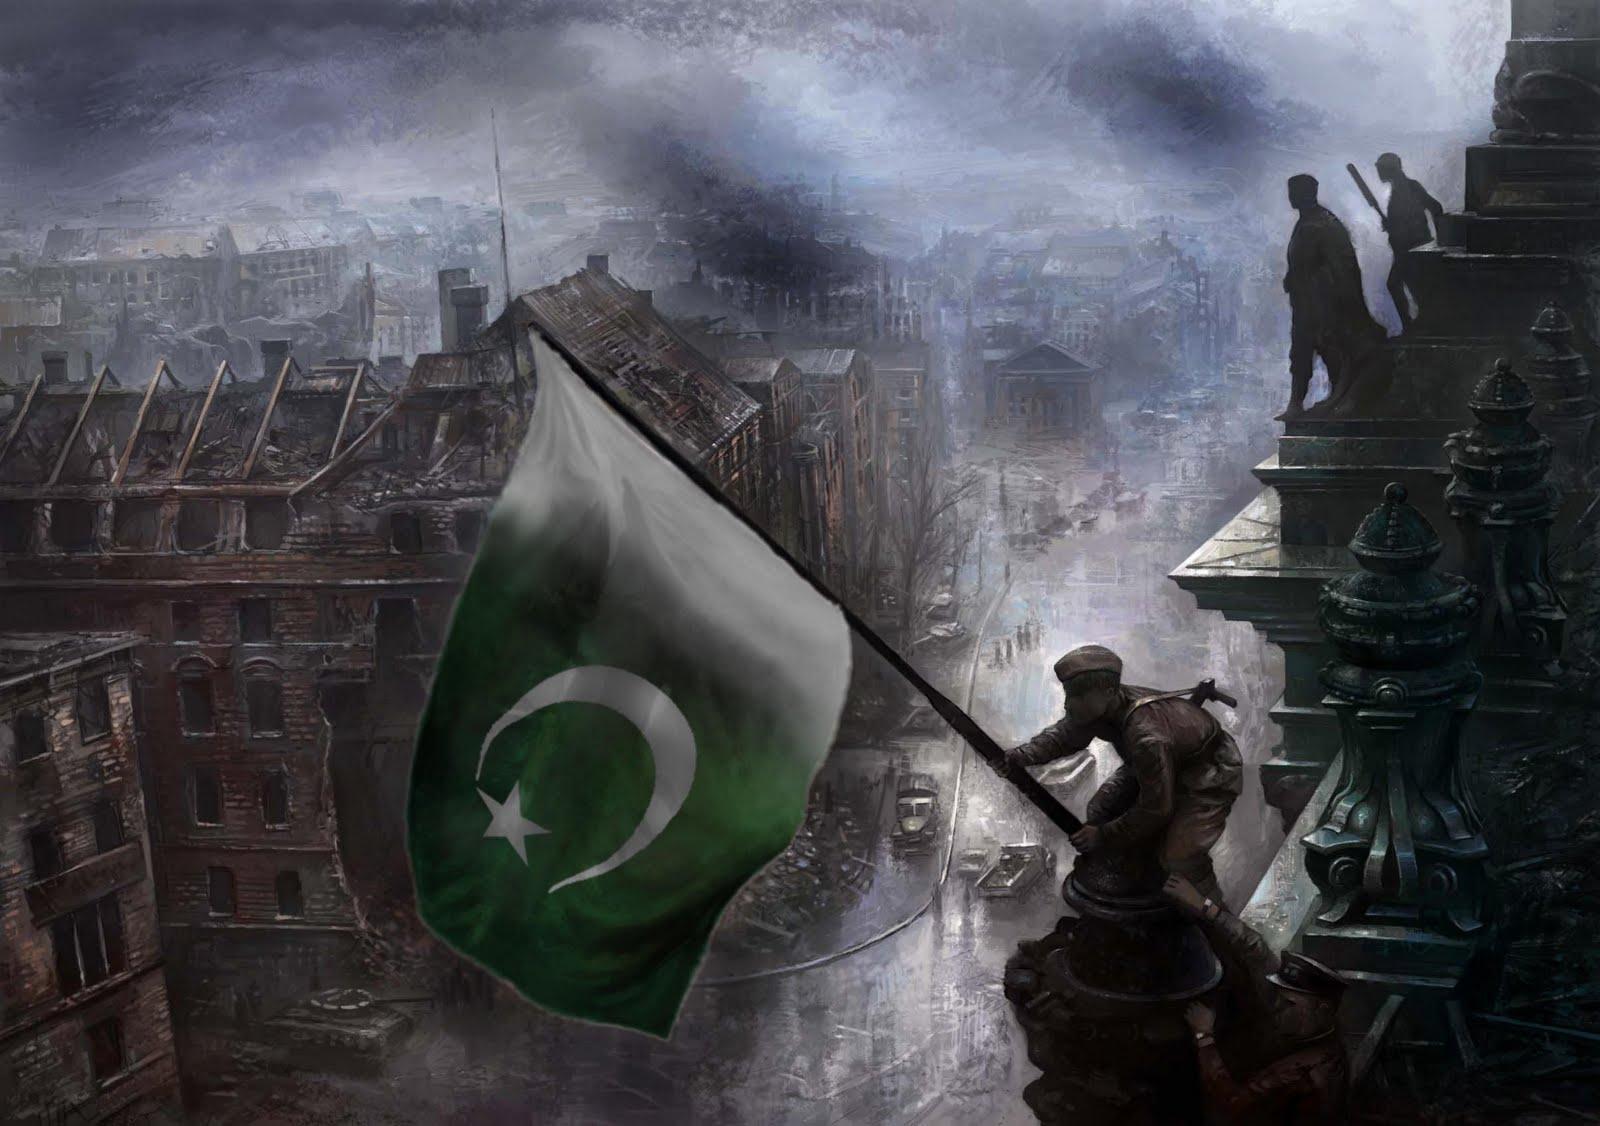 Army Pakistan Hd 4k Hd Desktop Wallpaper For 4k Ultra Hd: Pak Flag Wallpapers 2016